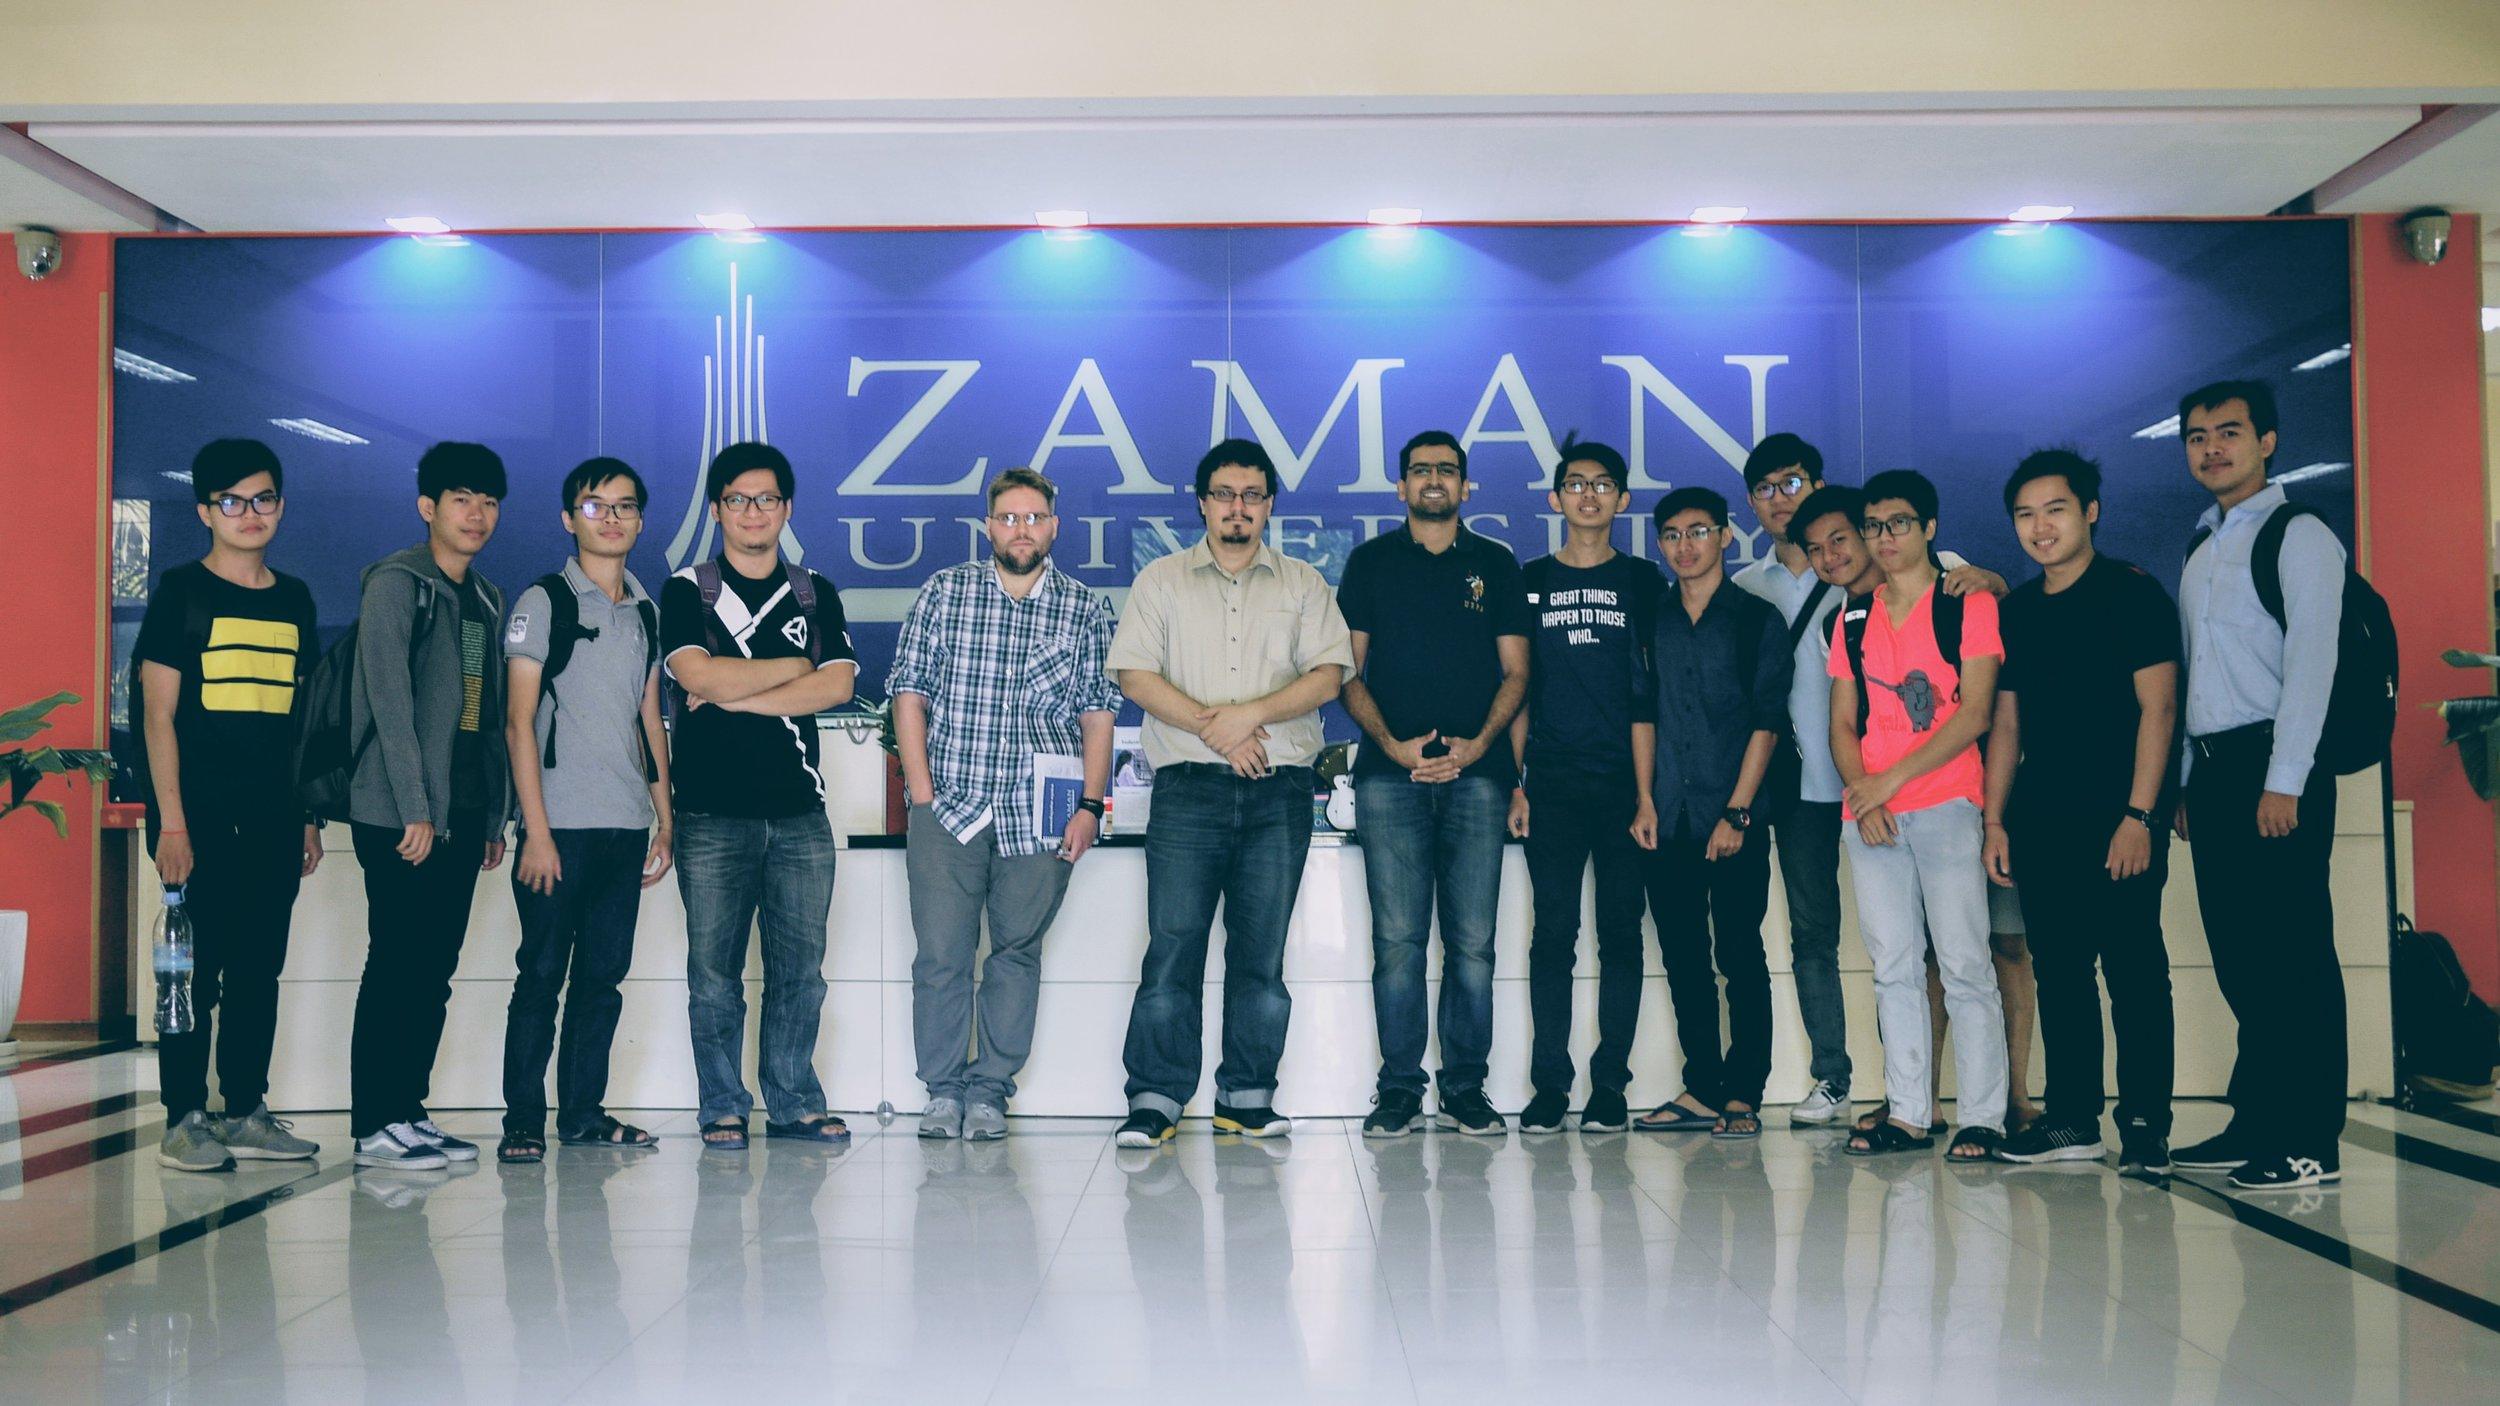 Wikipedia Workshop group picture at Zaman University on Friday, 12 January 2018.